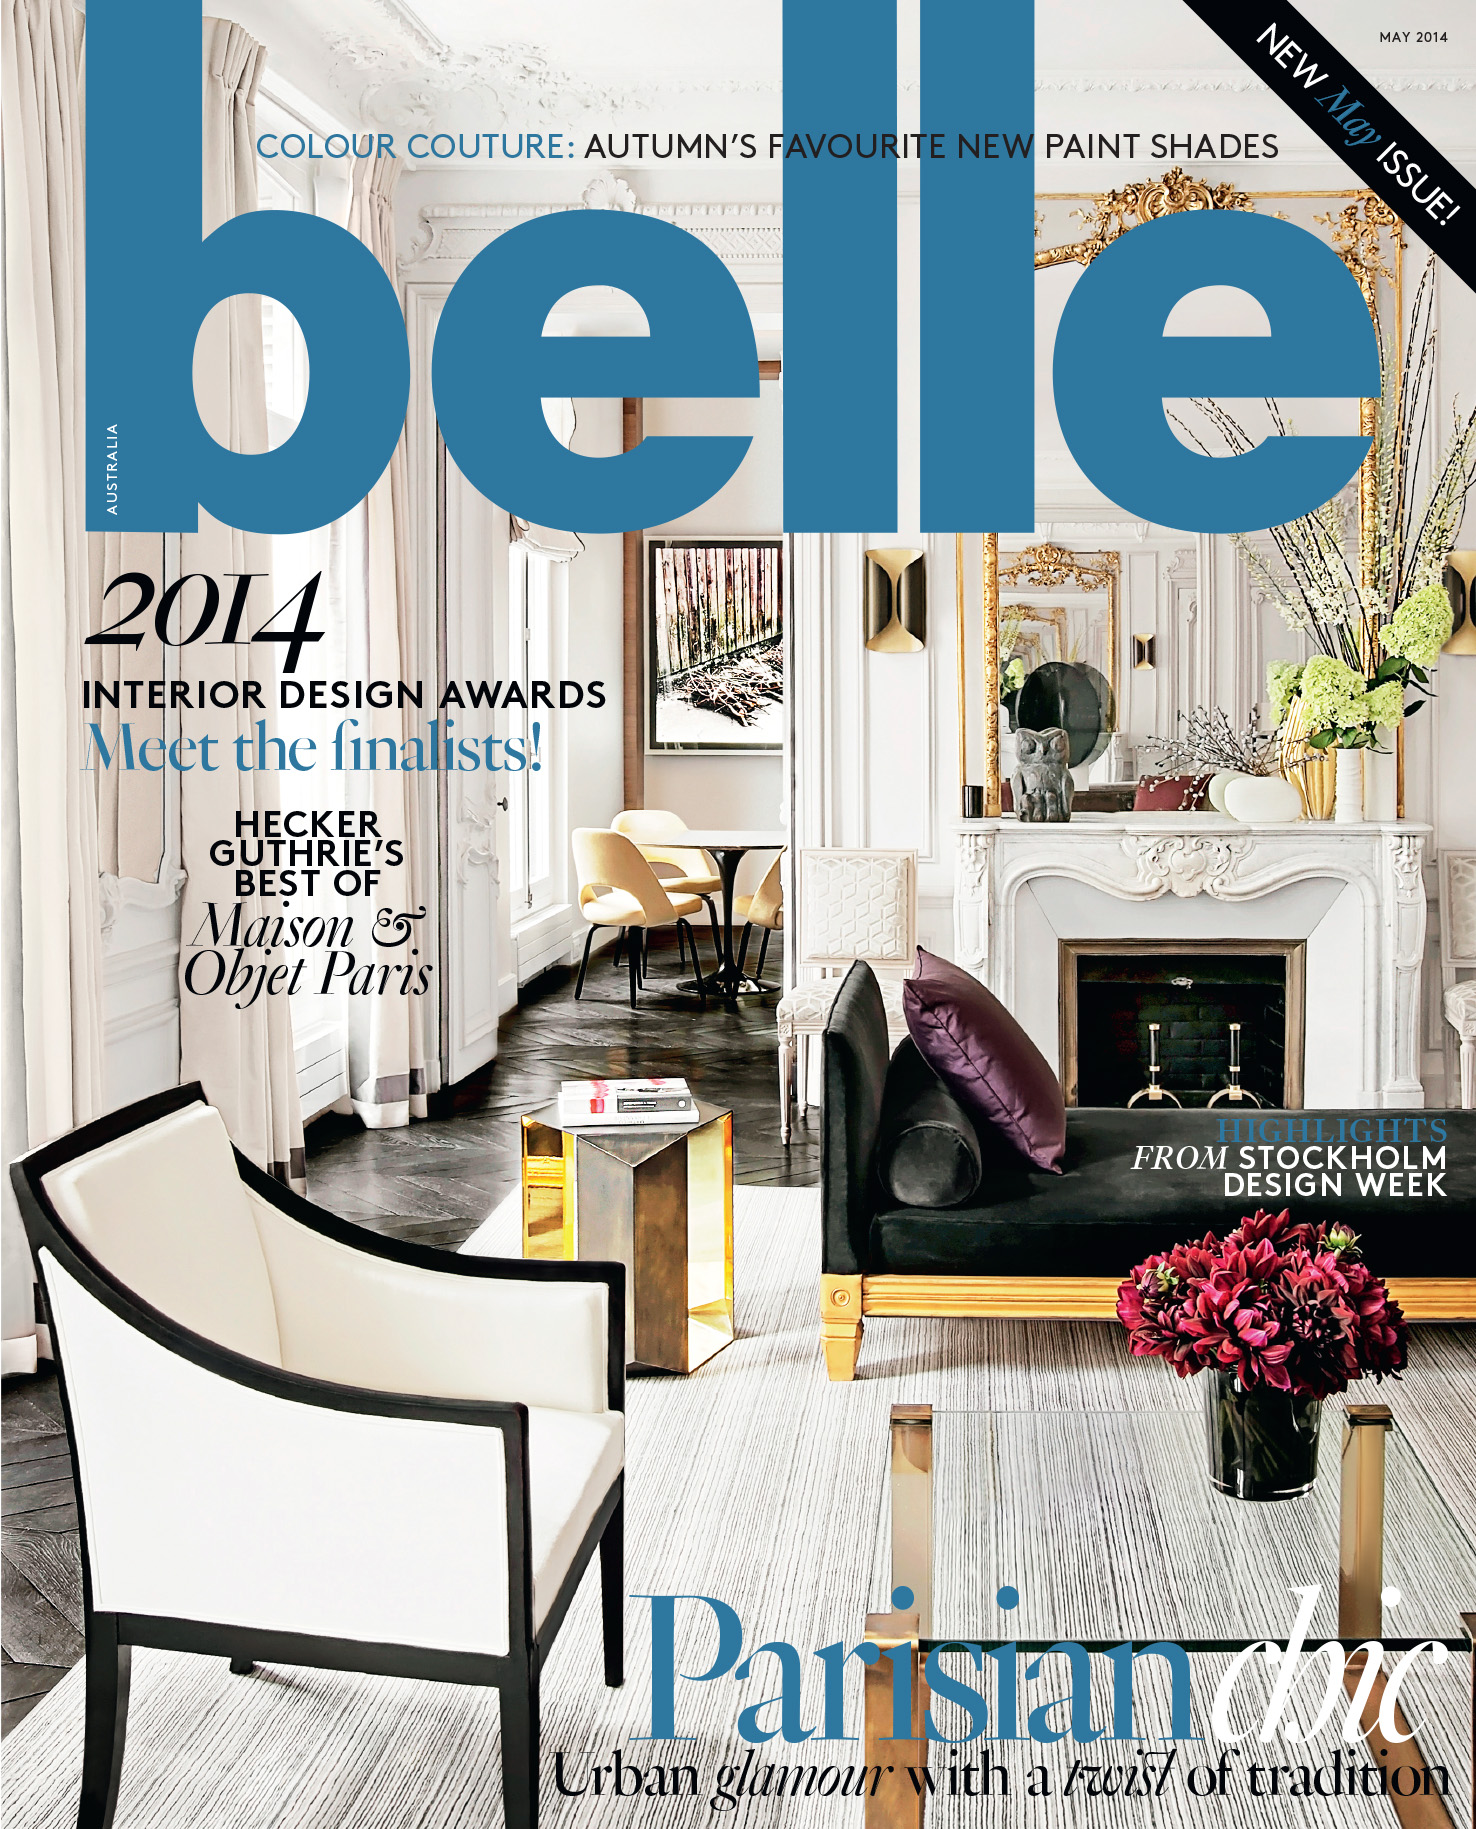 Belle May 2014, Cover.jpg